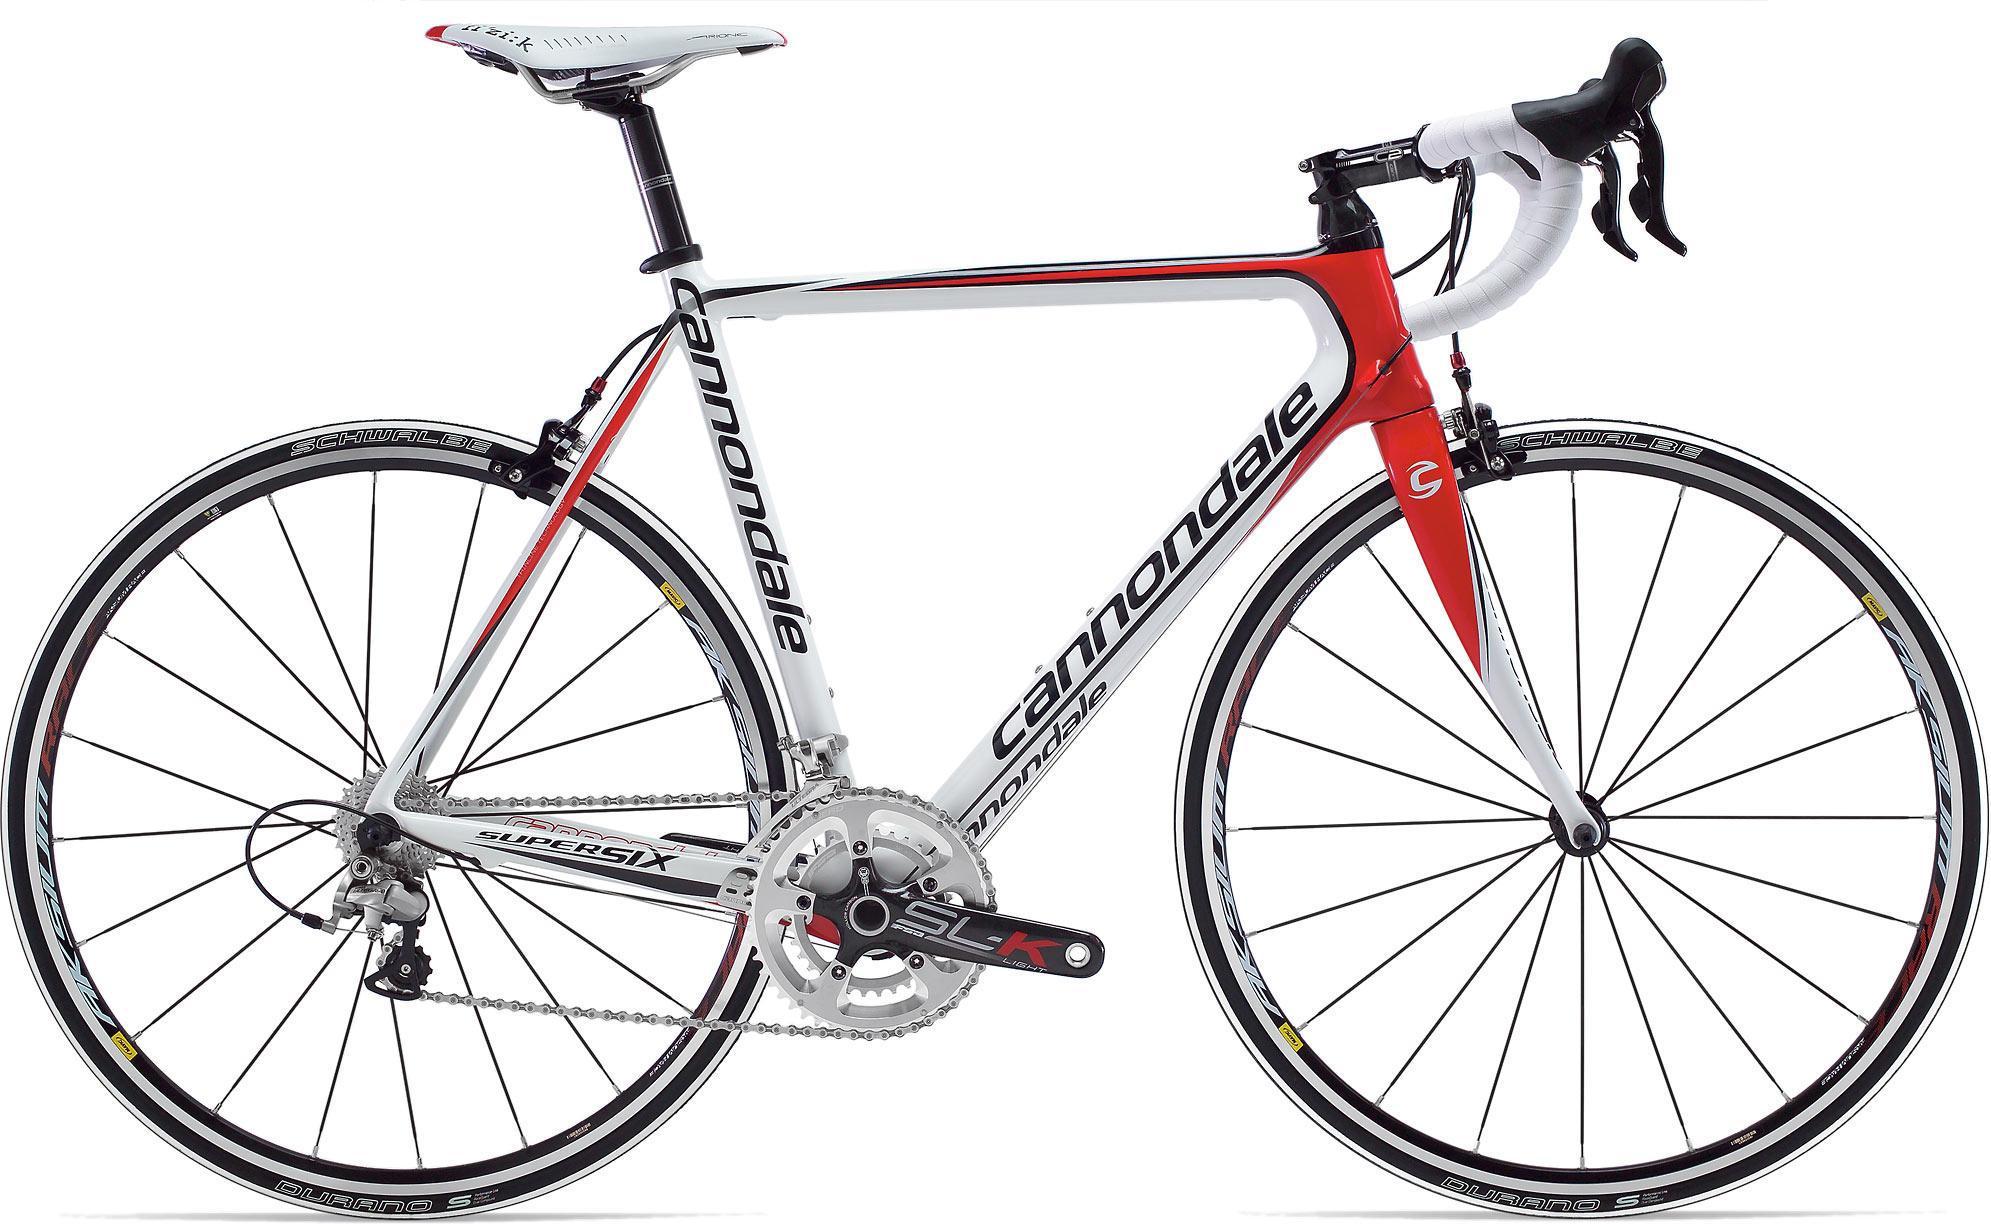 2011 Cannondale SuperSix 5 - Bicycle Details ...